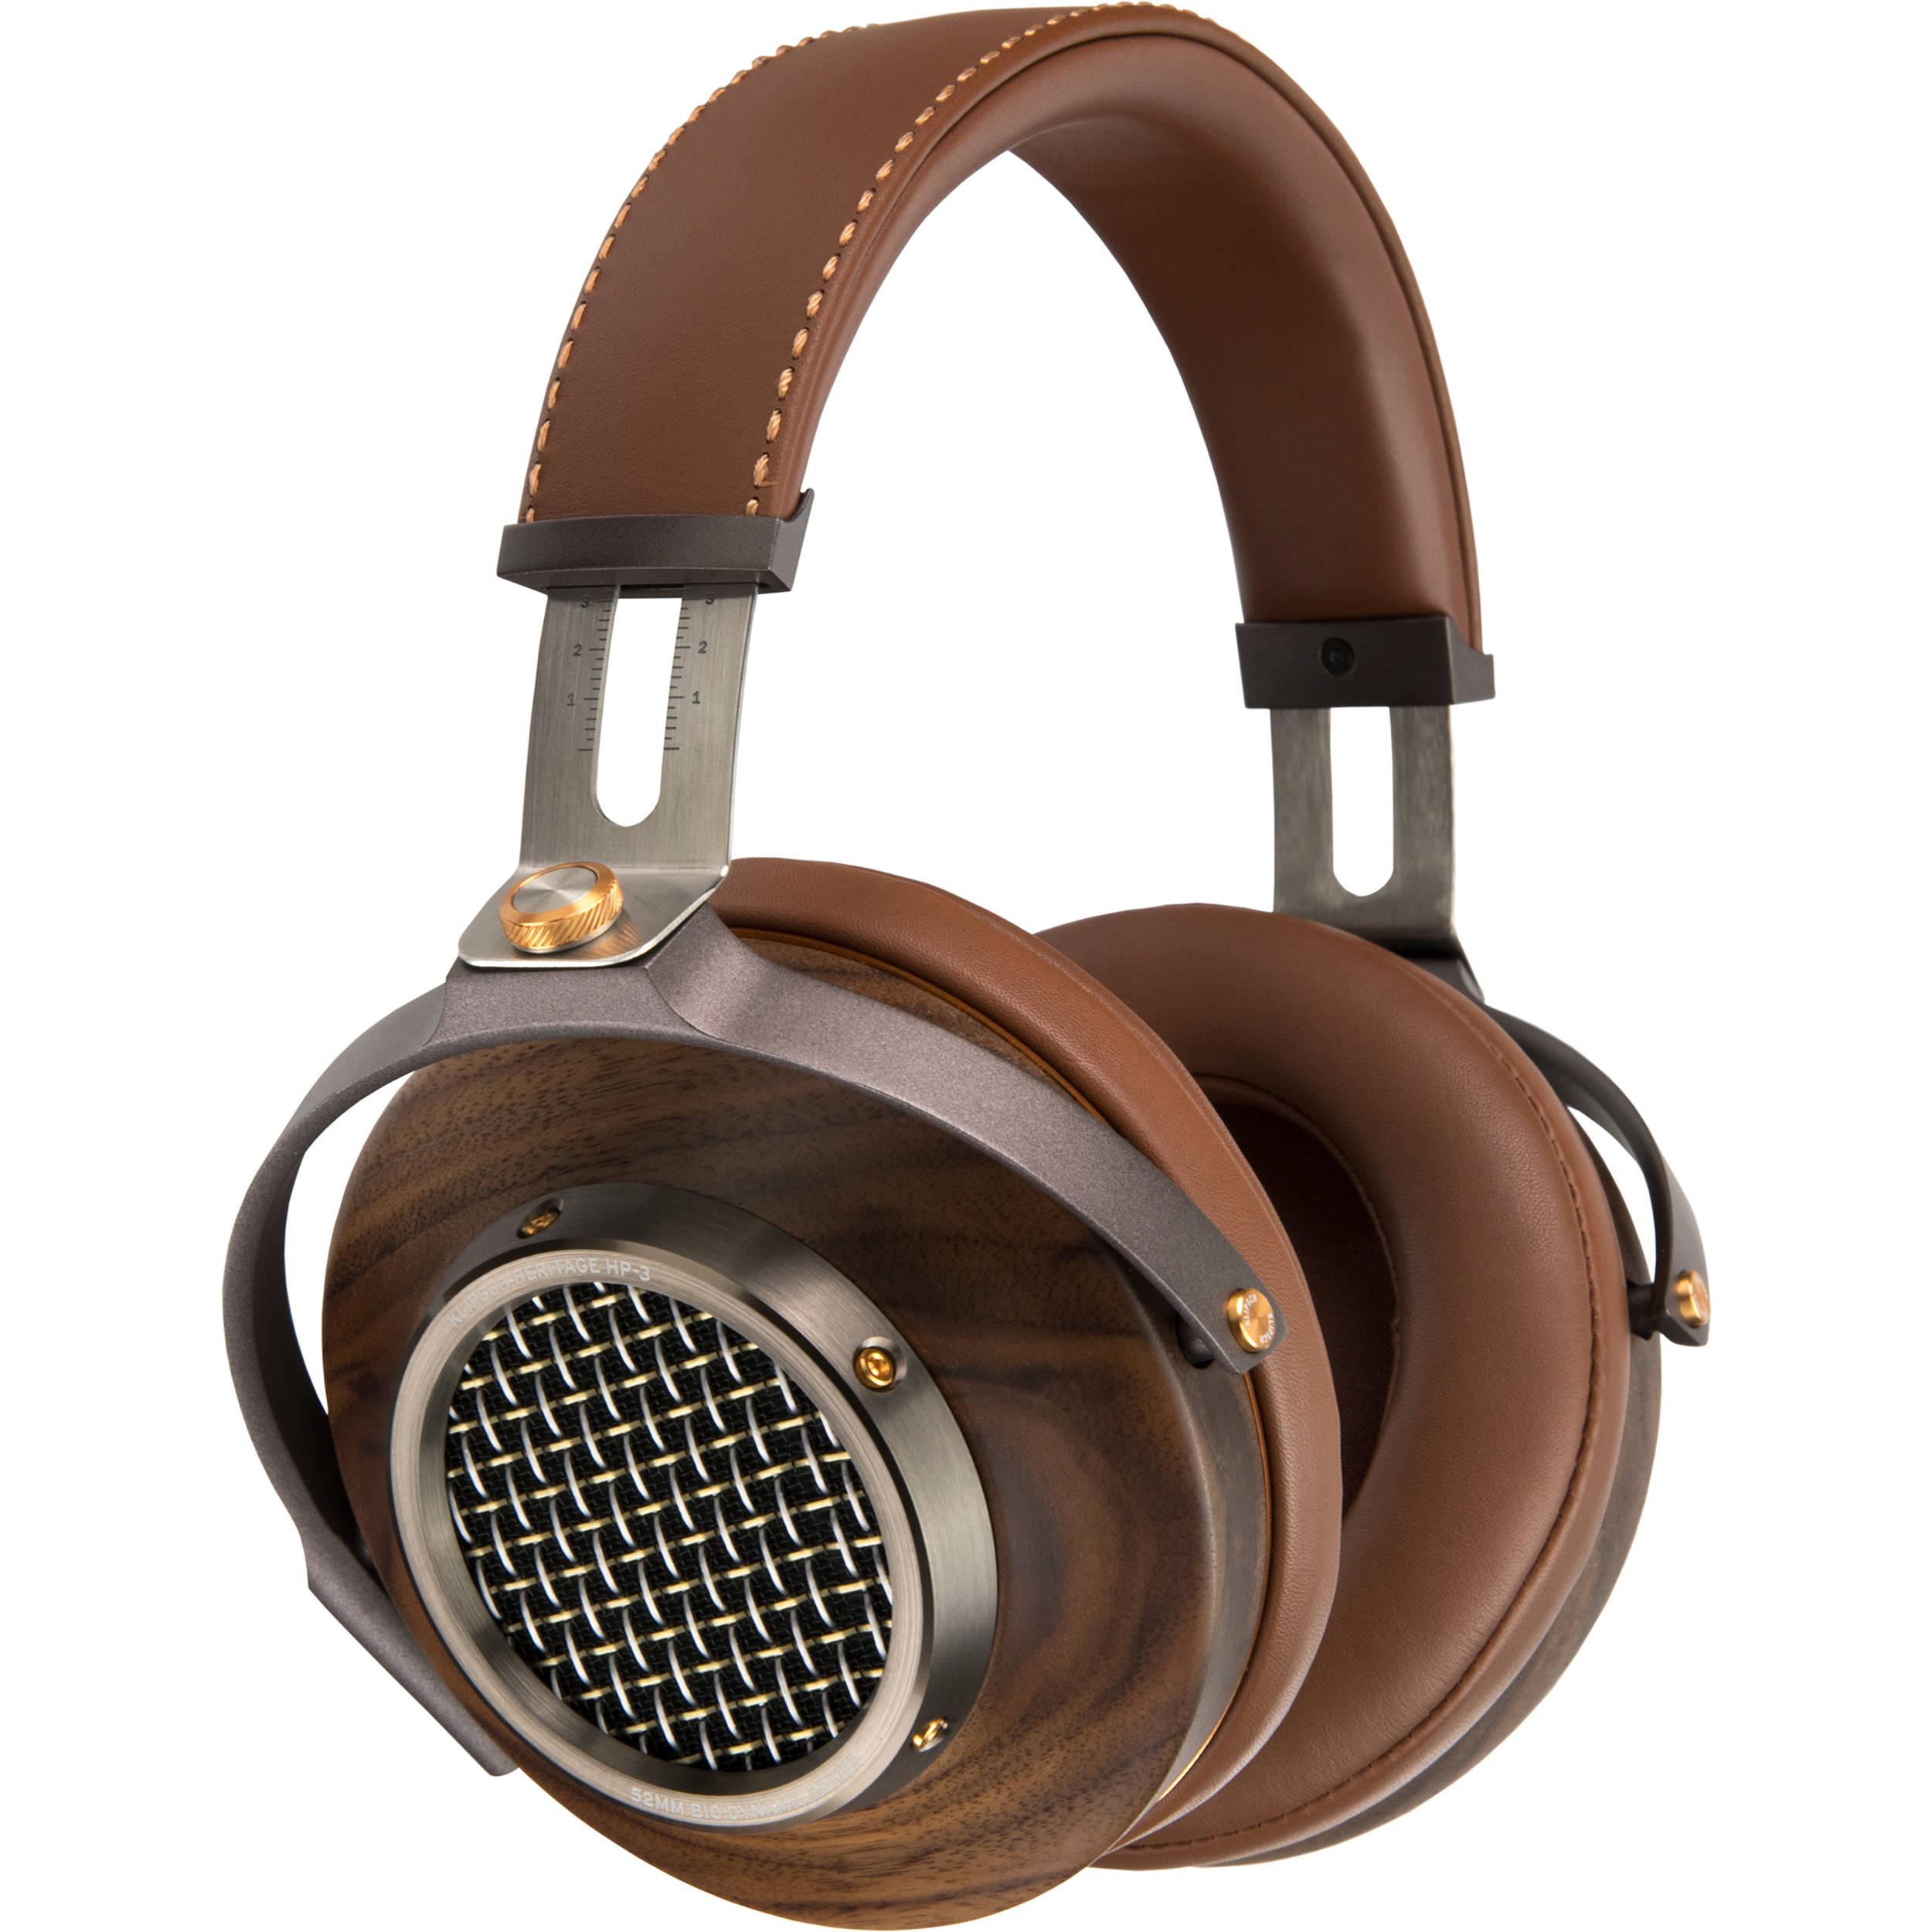 6eadb111c02 KlipschHeritage HP-3 Over-Ear Headphones (Walnut)